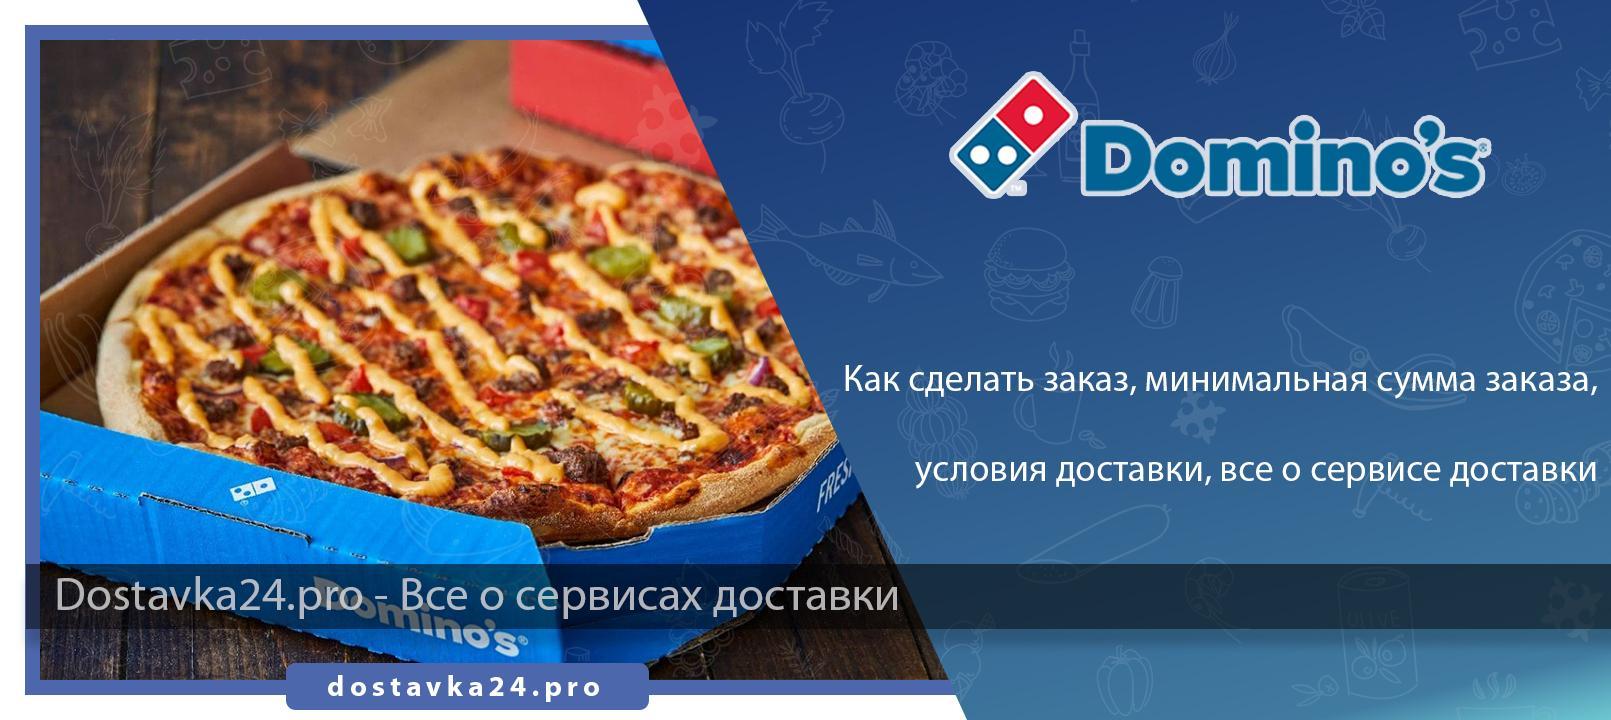 Доминос пицца сервис доставки